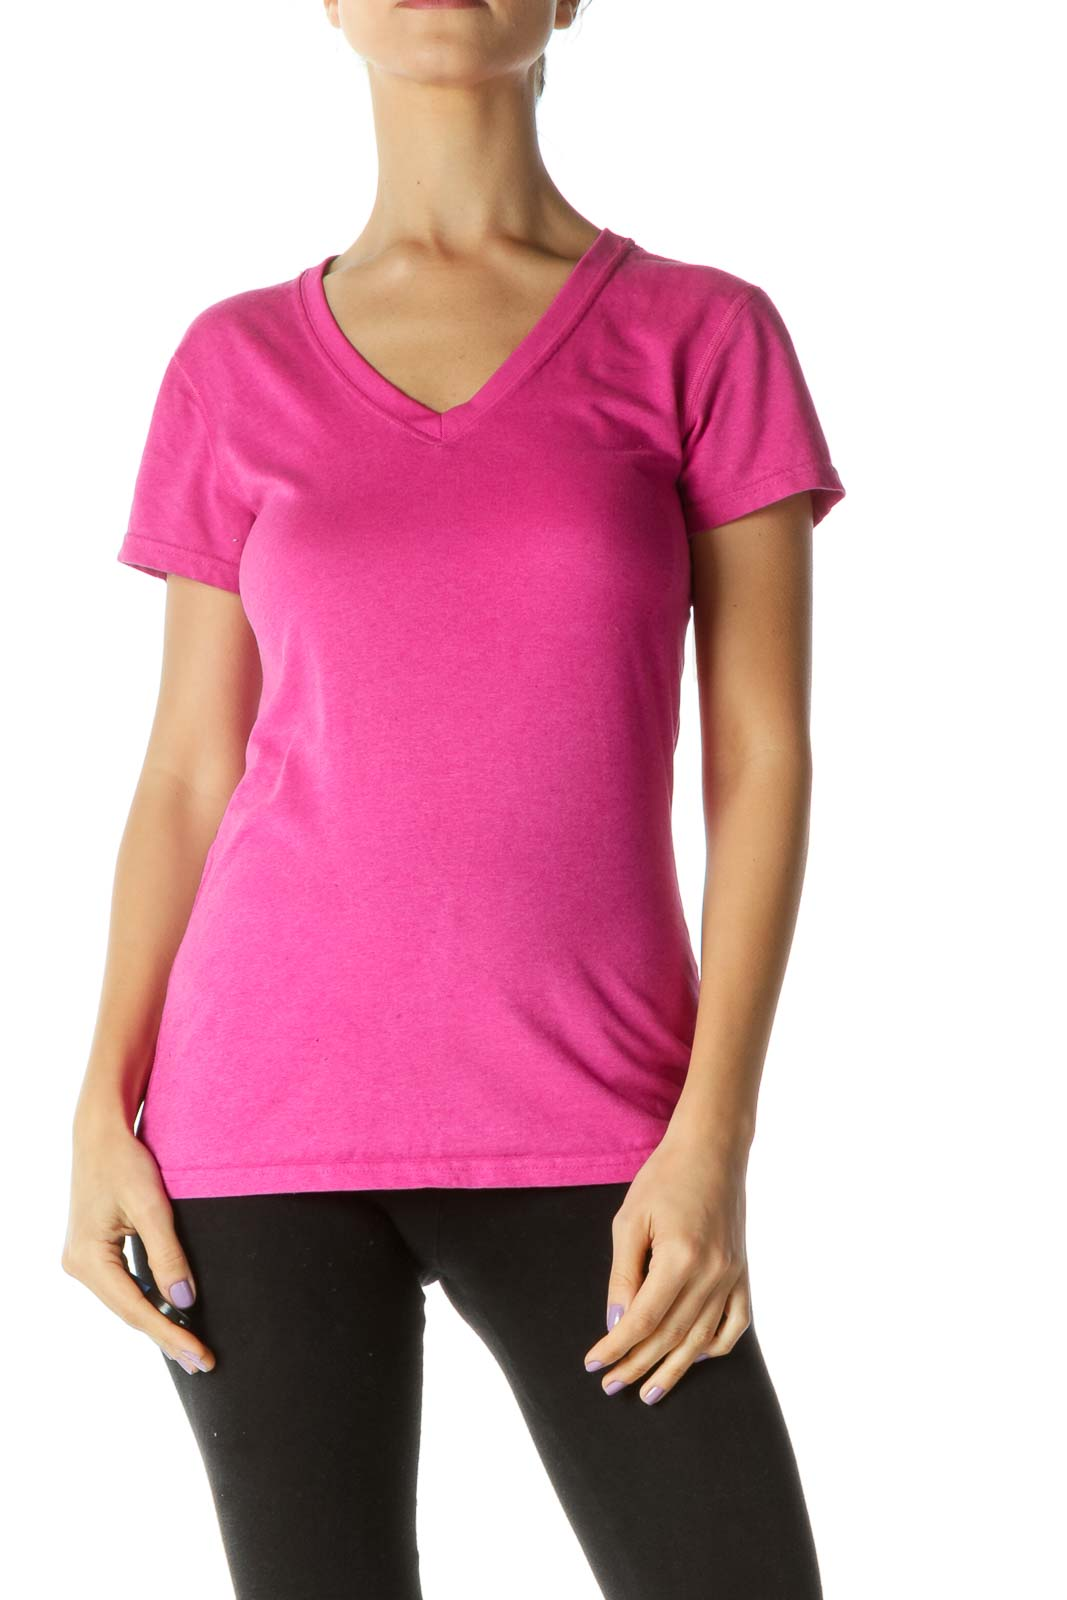 Pink V-neck Sports Top